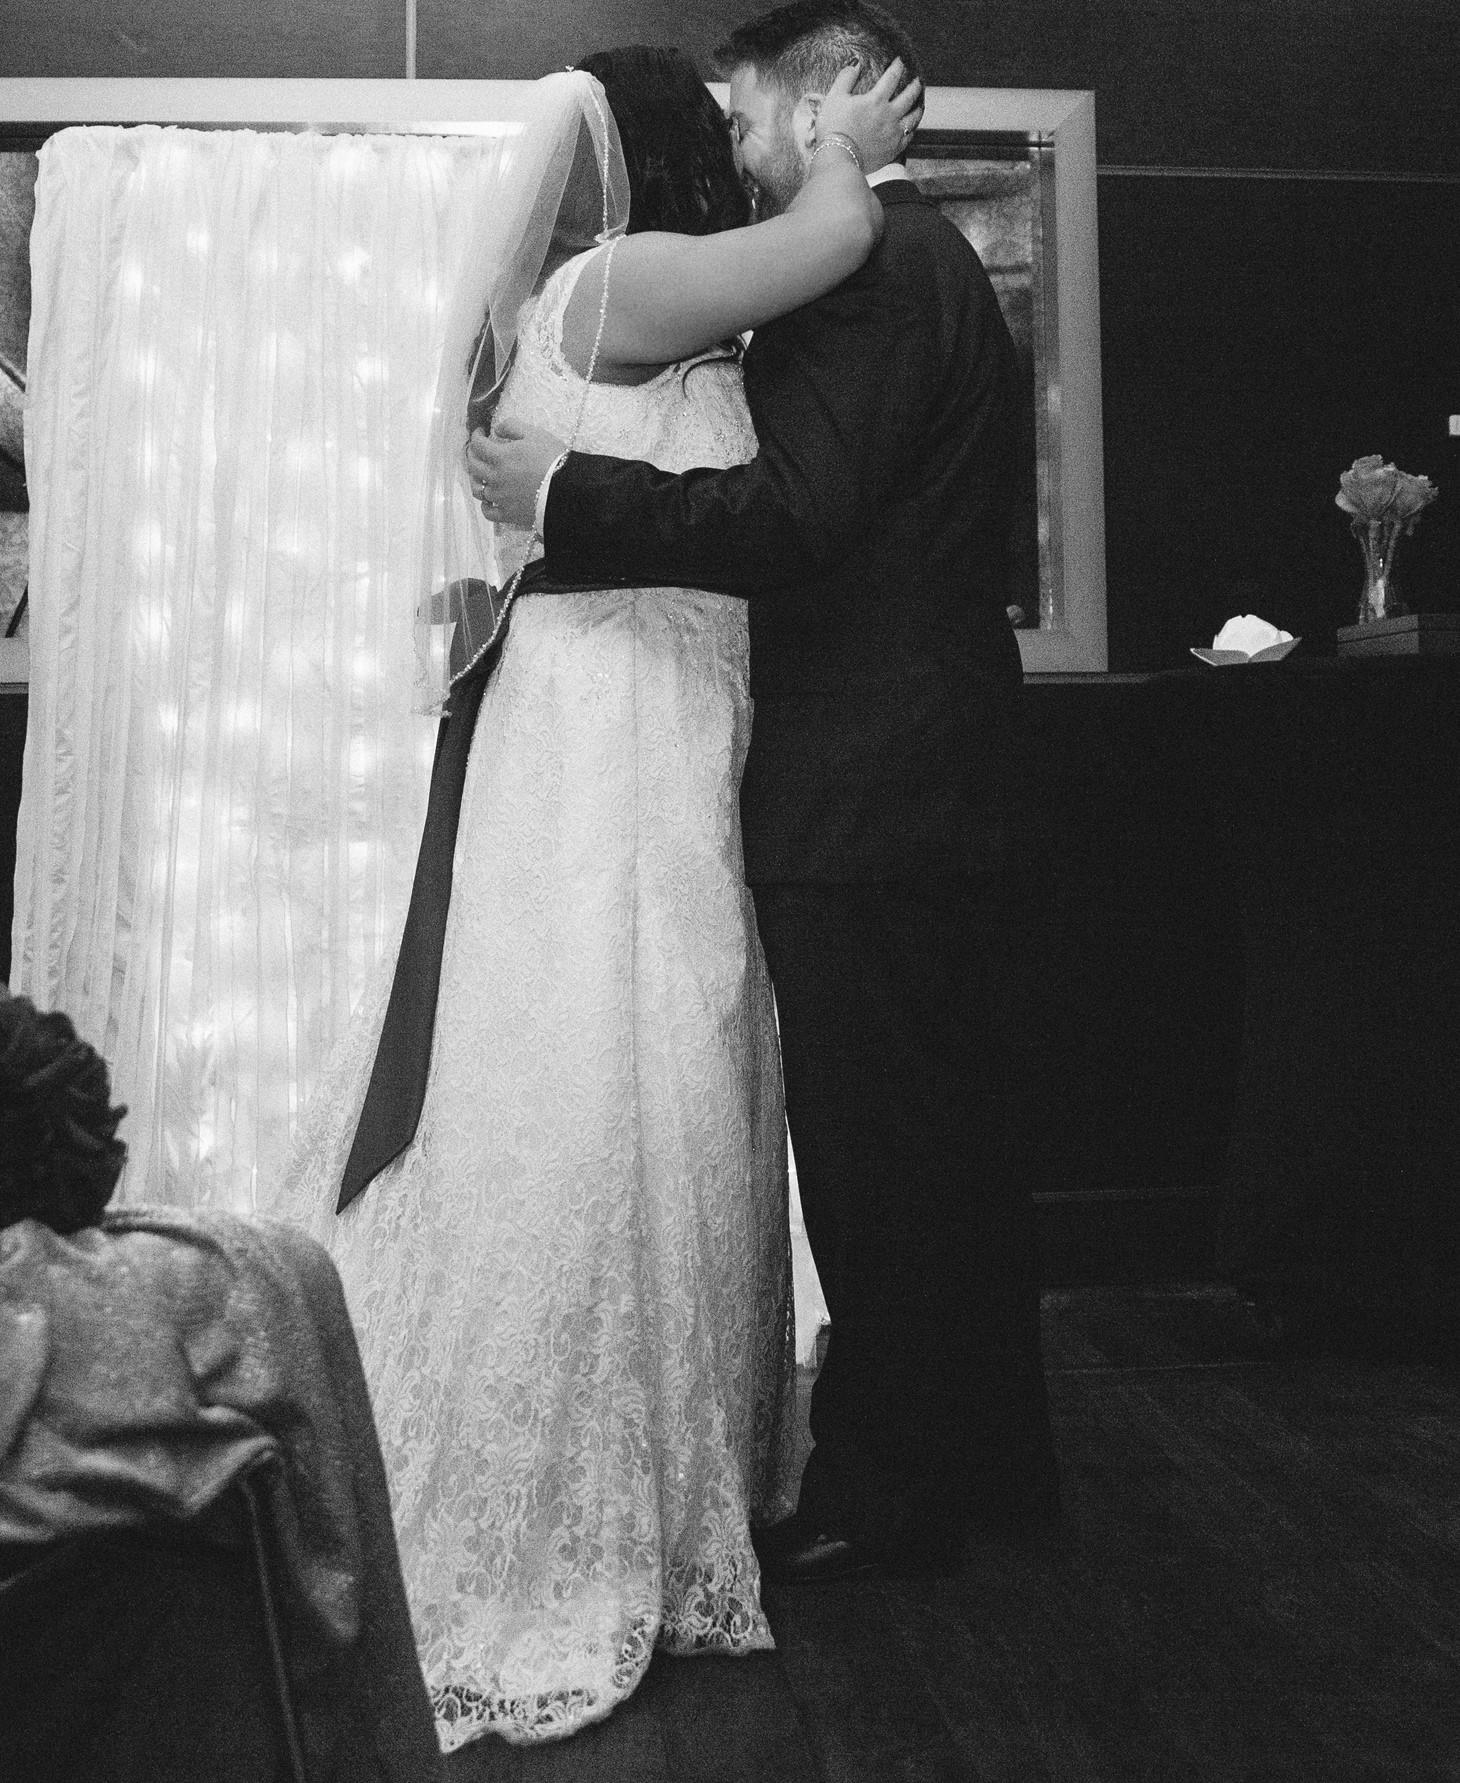 041-nyc-wedding-portrait-photographer-times-square-muse-hotel-winter-wedding-smitten-chickens.jpg